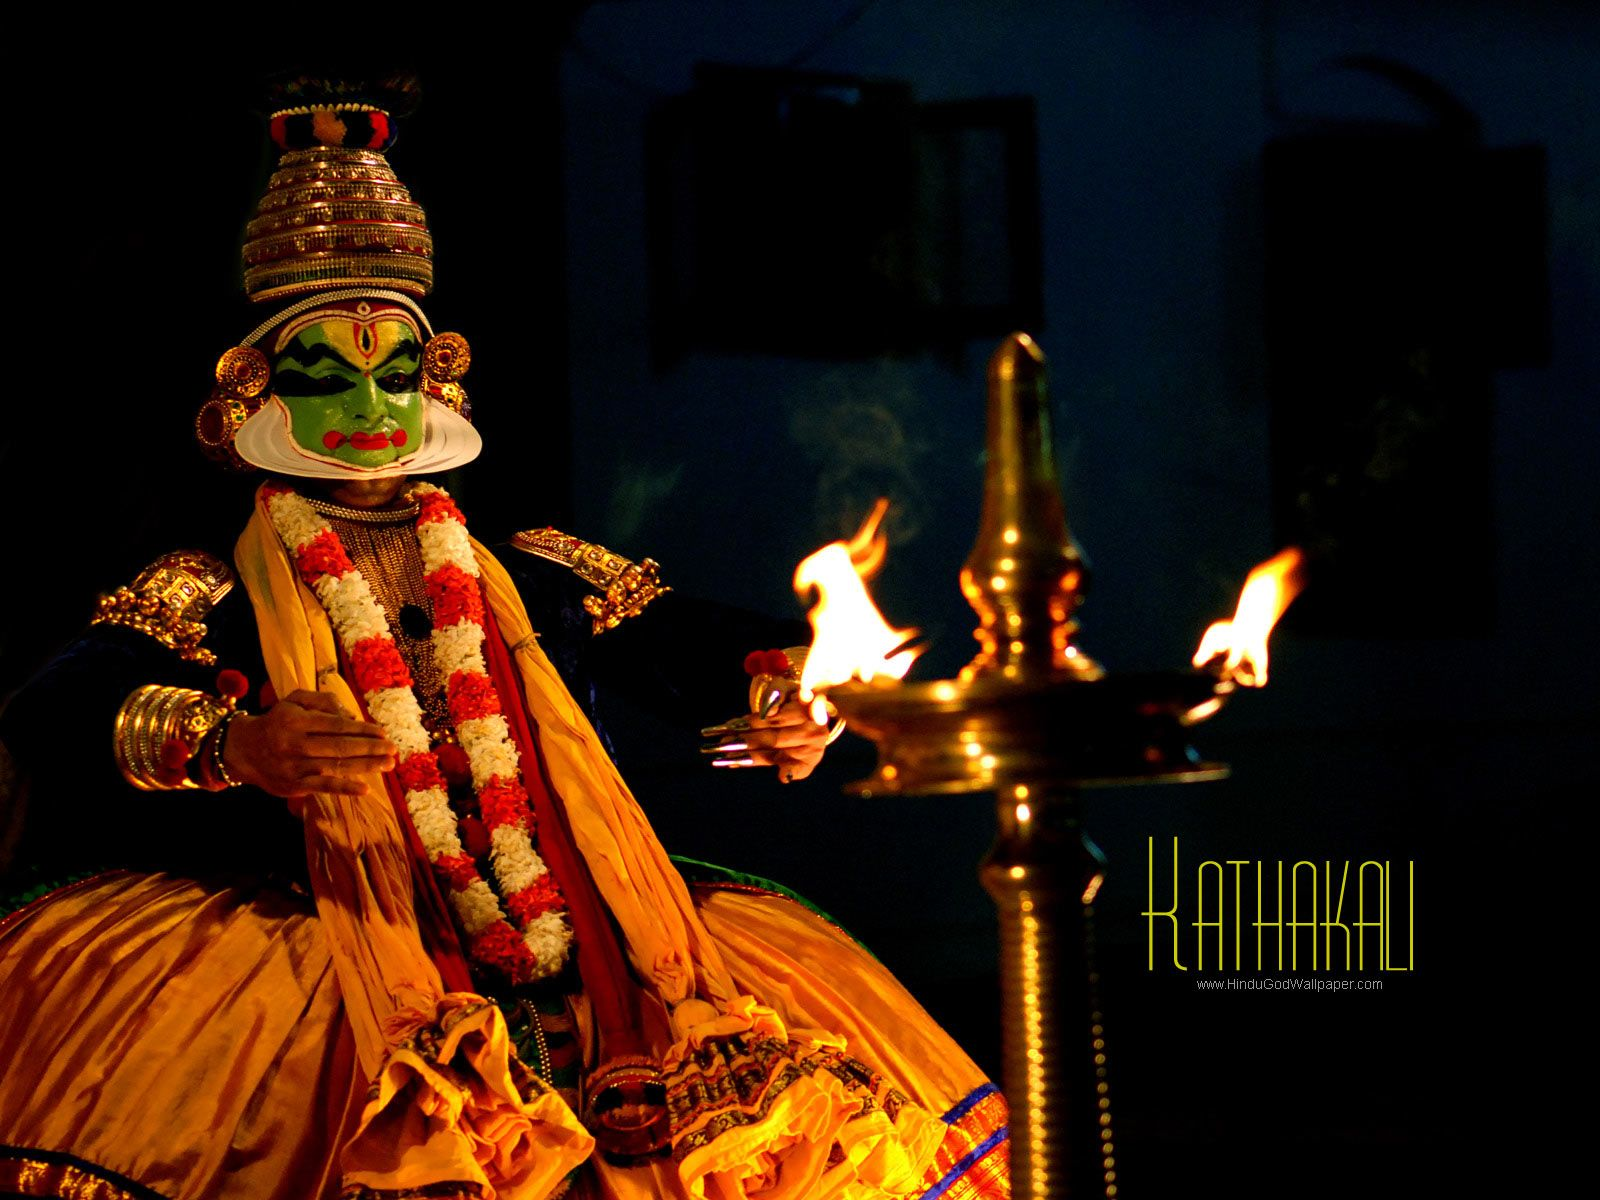 Hd wallpaper kerala - Free Kathakali Pictures Wallpapers Download